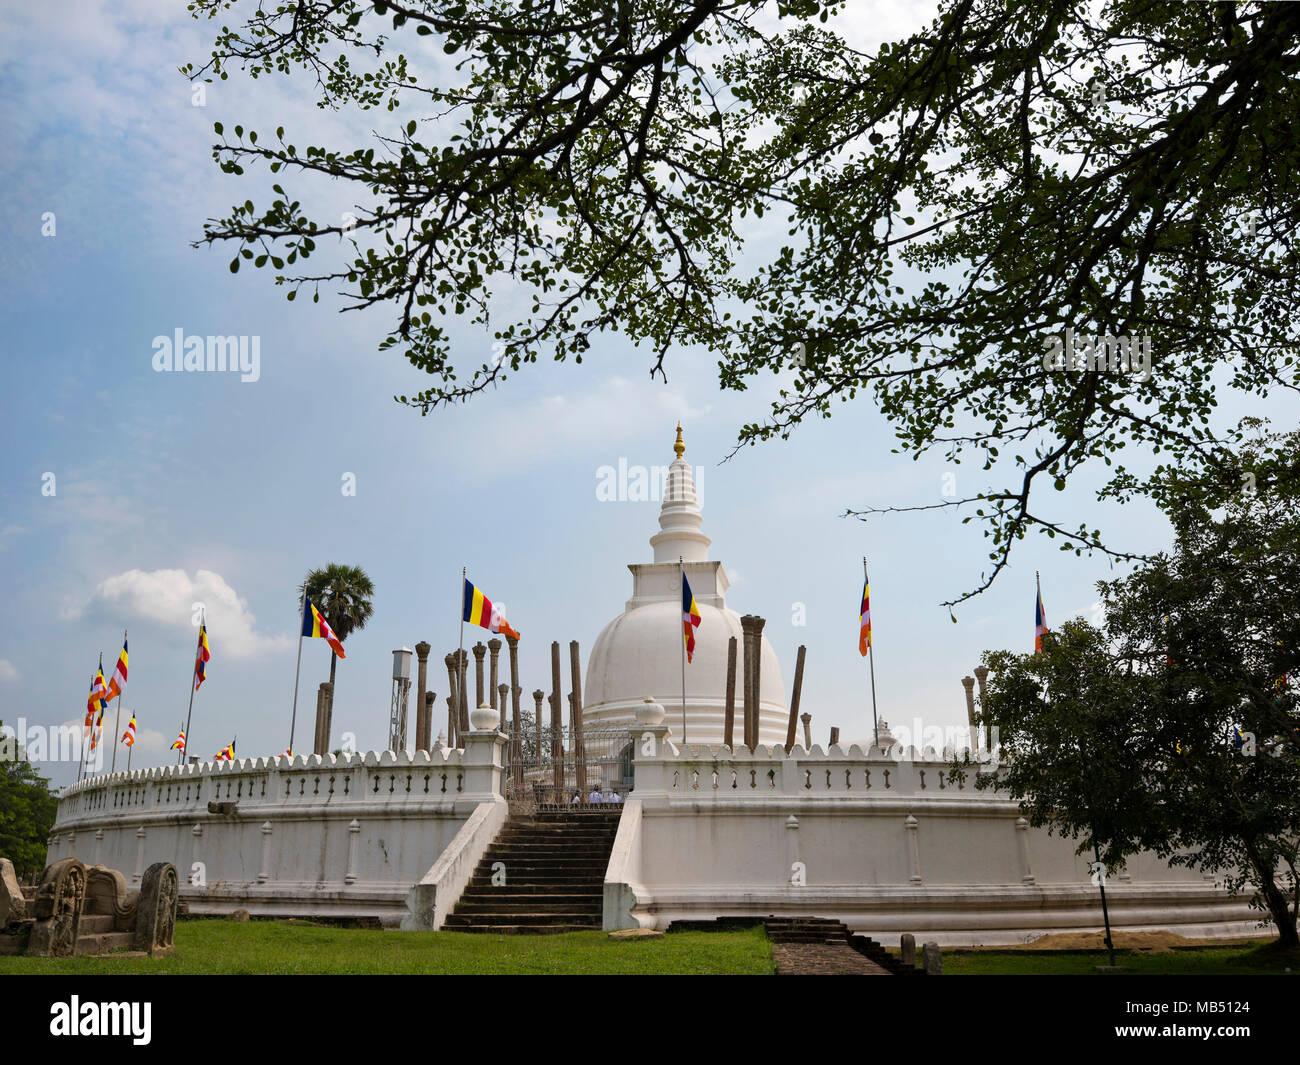 Horizontal view of Thuparamaya dagoba or stupa in Anuradhapura, Sri Lanka. - Stock Image